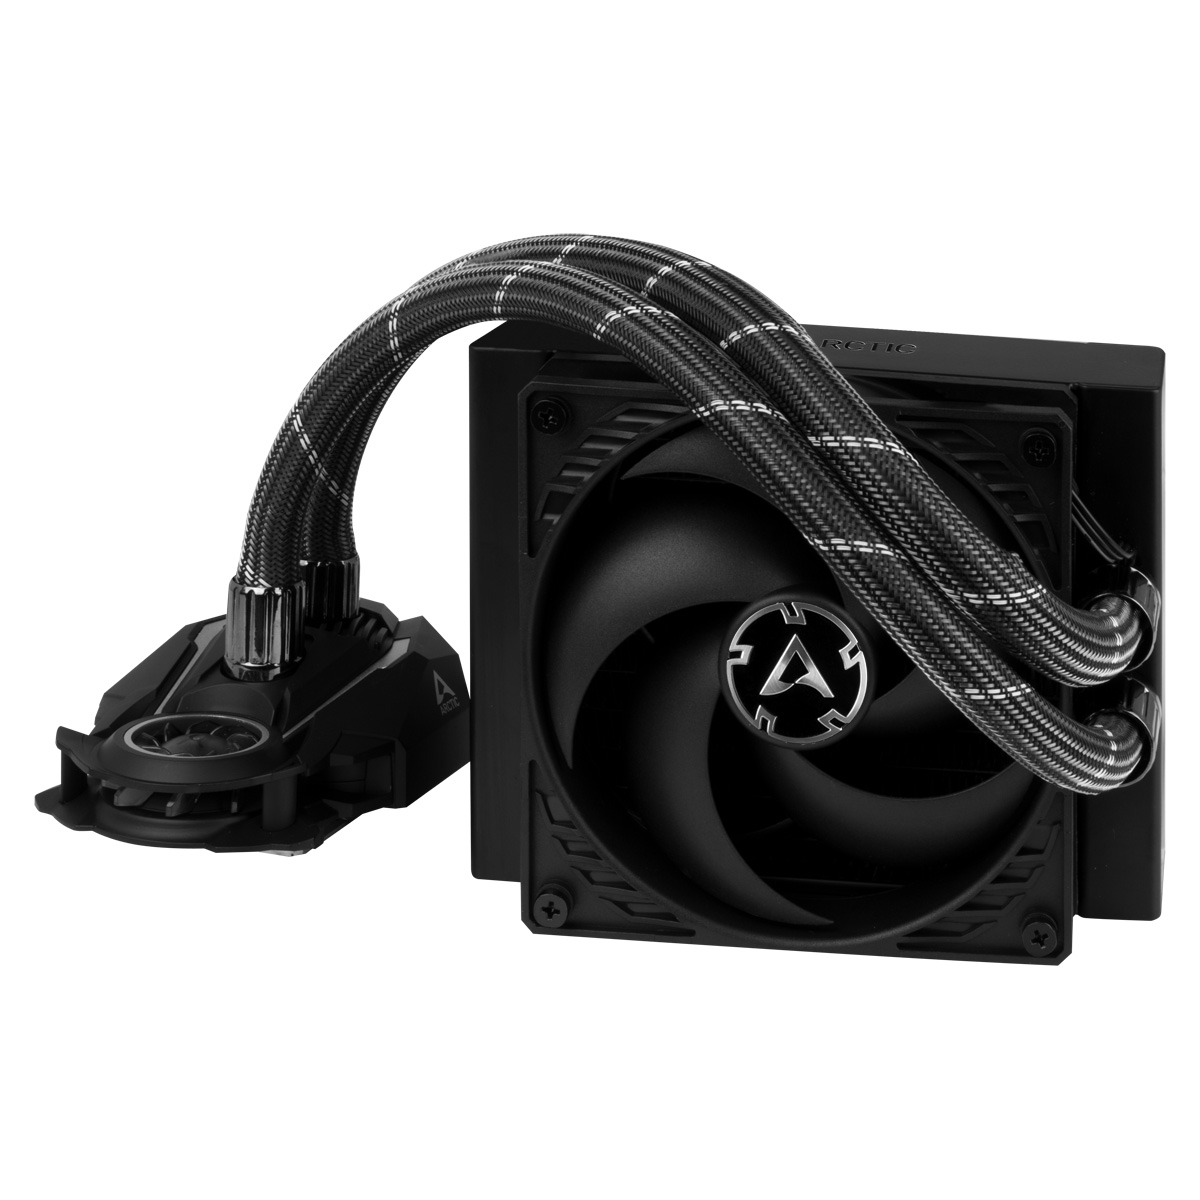 Multi-Compatible AiO CPU Water Cooler ARCTIC Liquid Freezer II 120 Front View